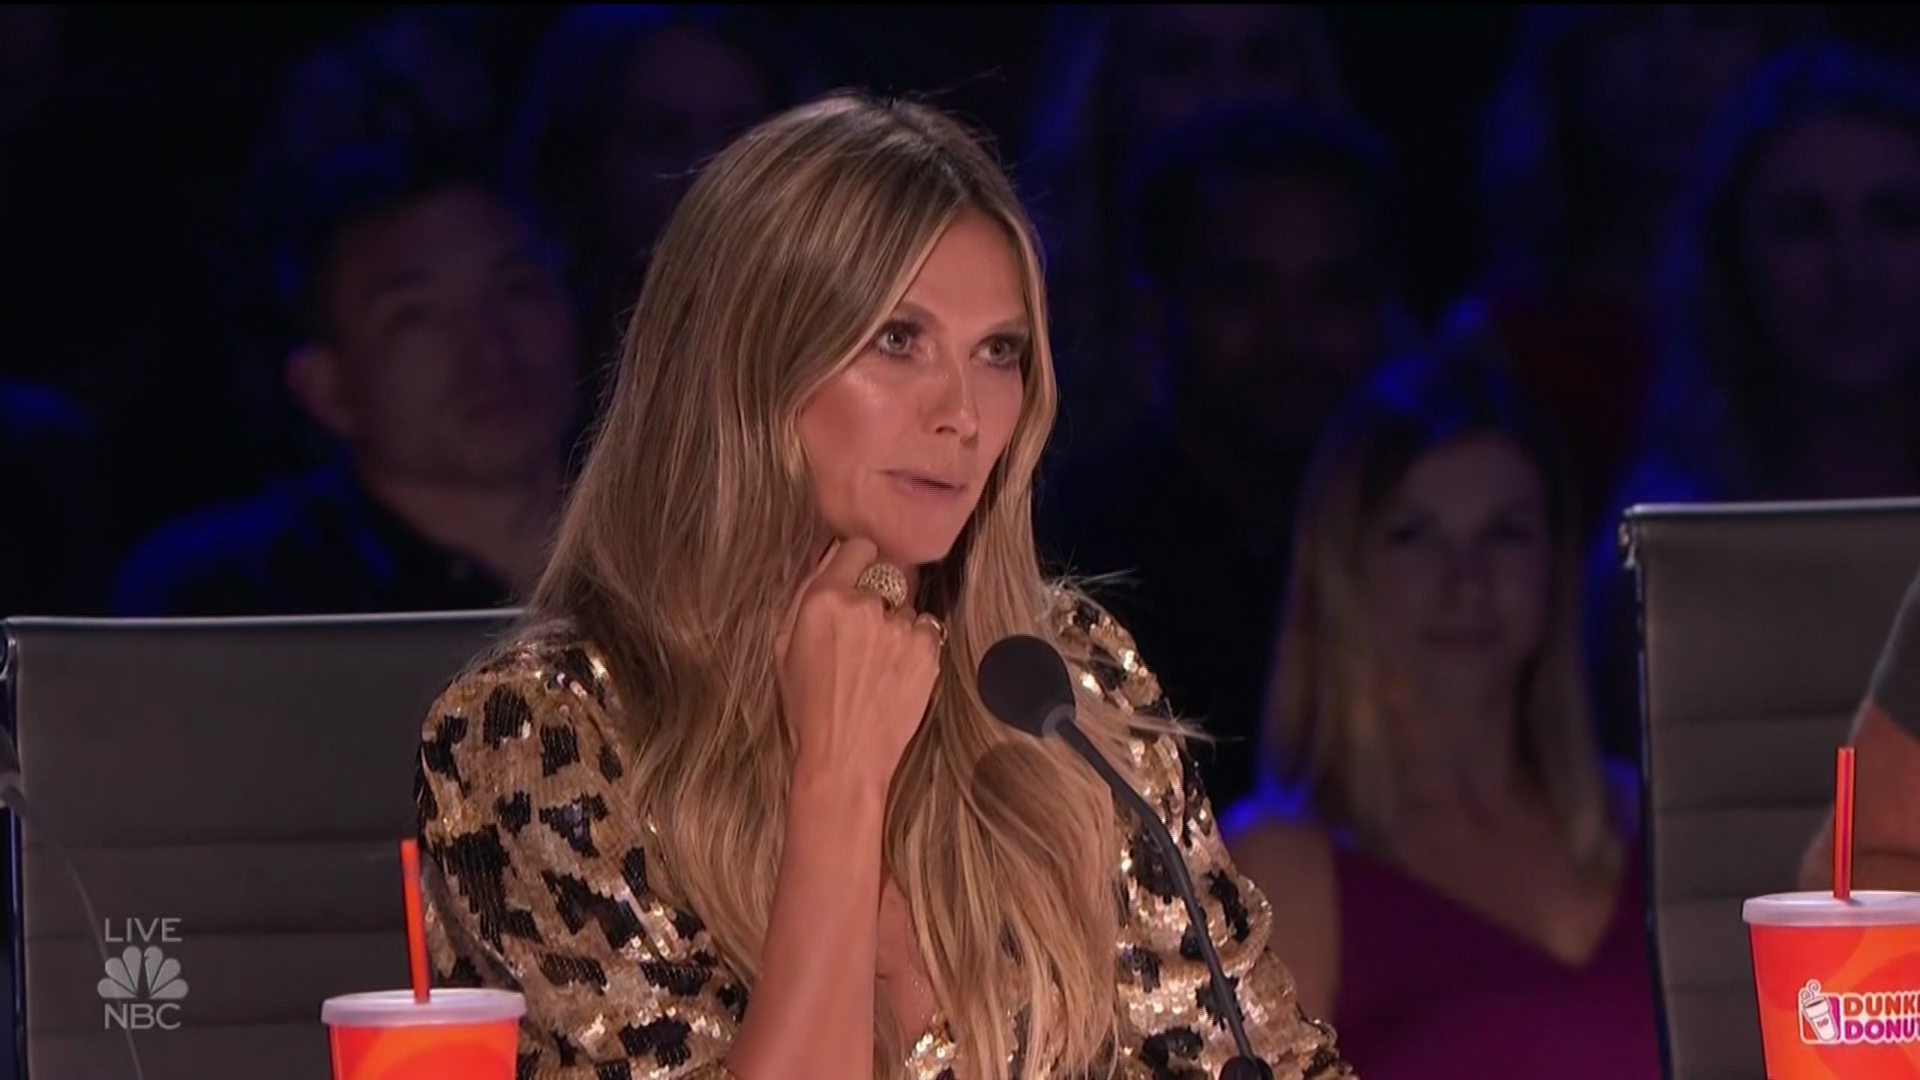 America's Got Talent Live Quarter Finals 3 as seen on 'NBC.